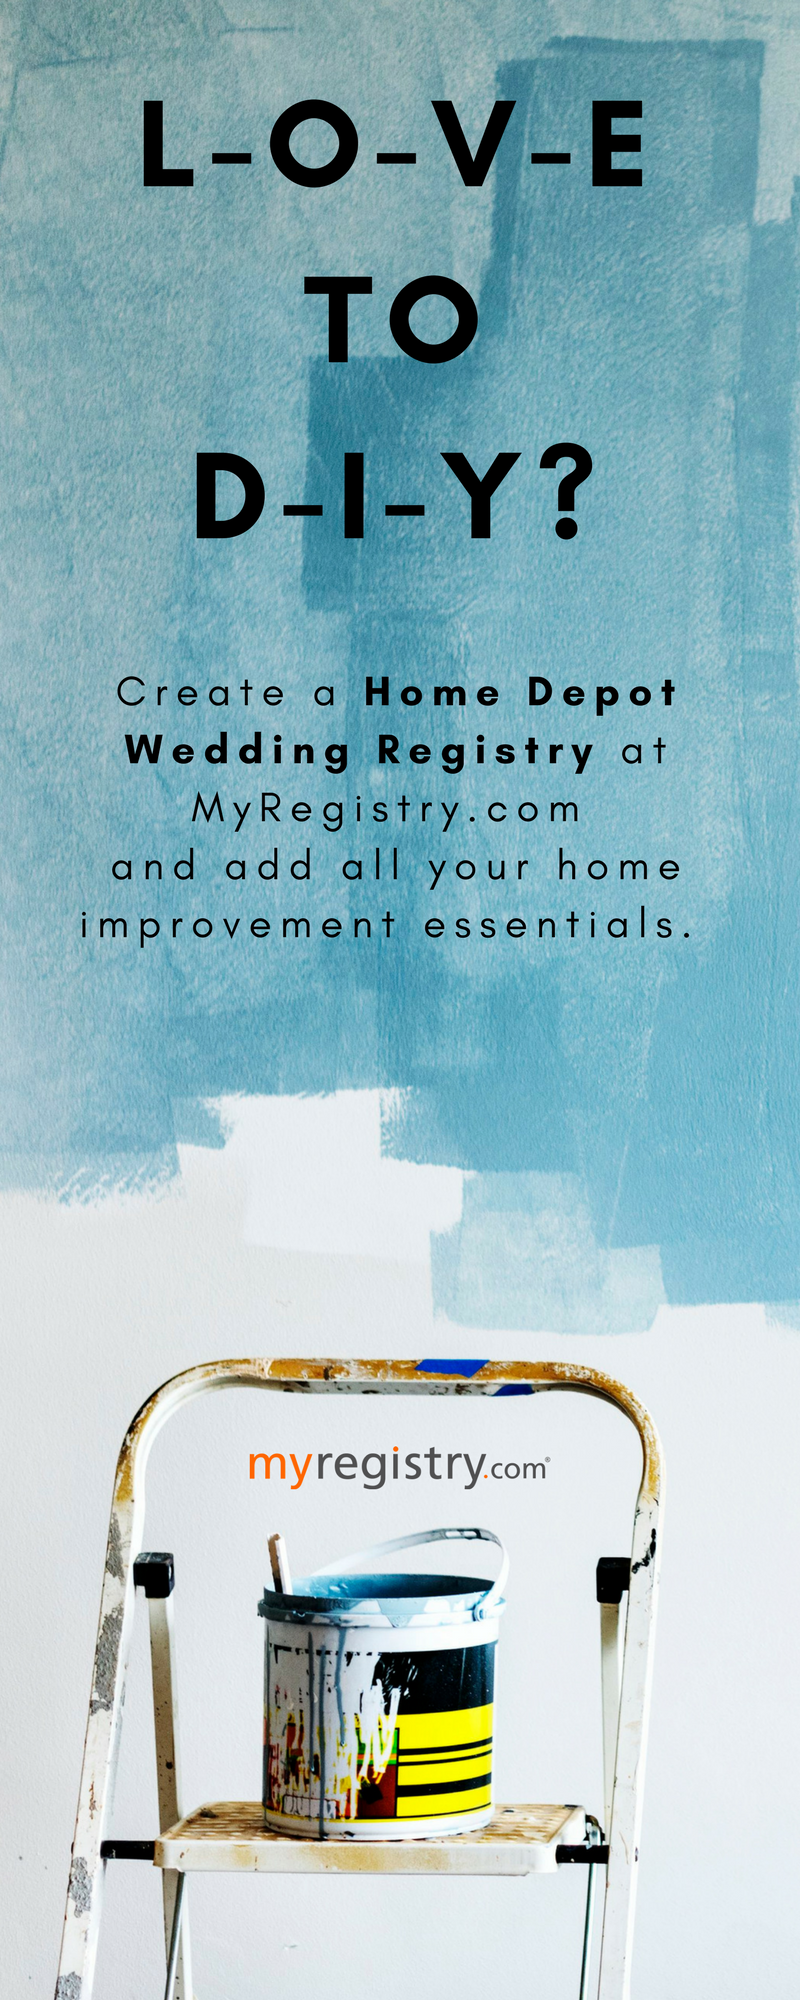 Home Depot Wedding Registry.Home Depot Wedding Registry Myregistry Com Home Improvement